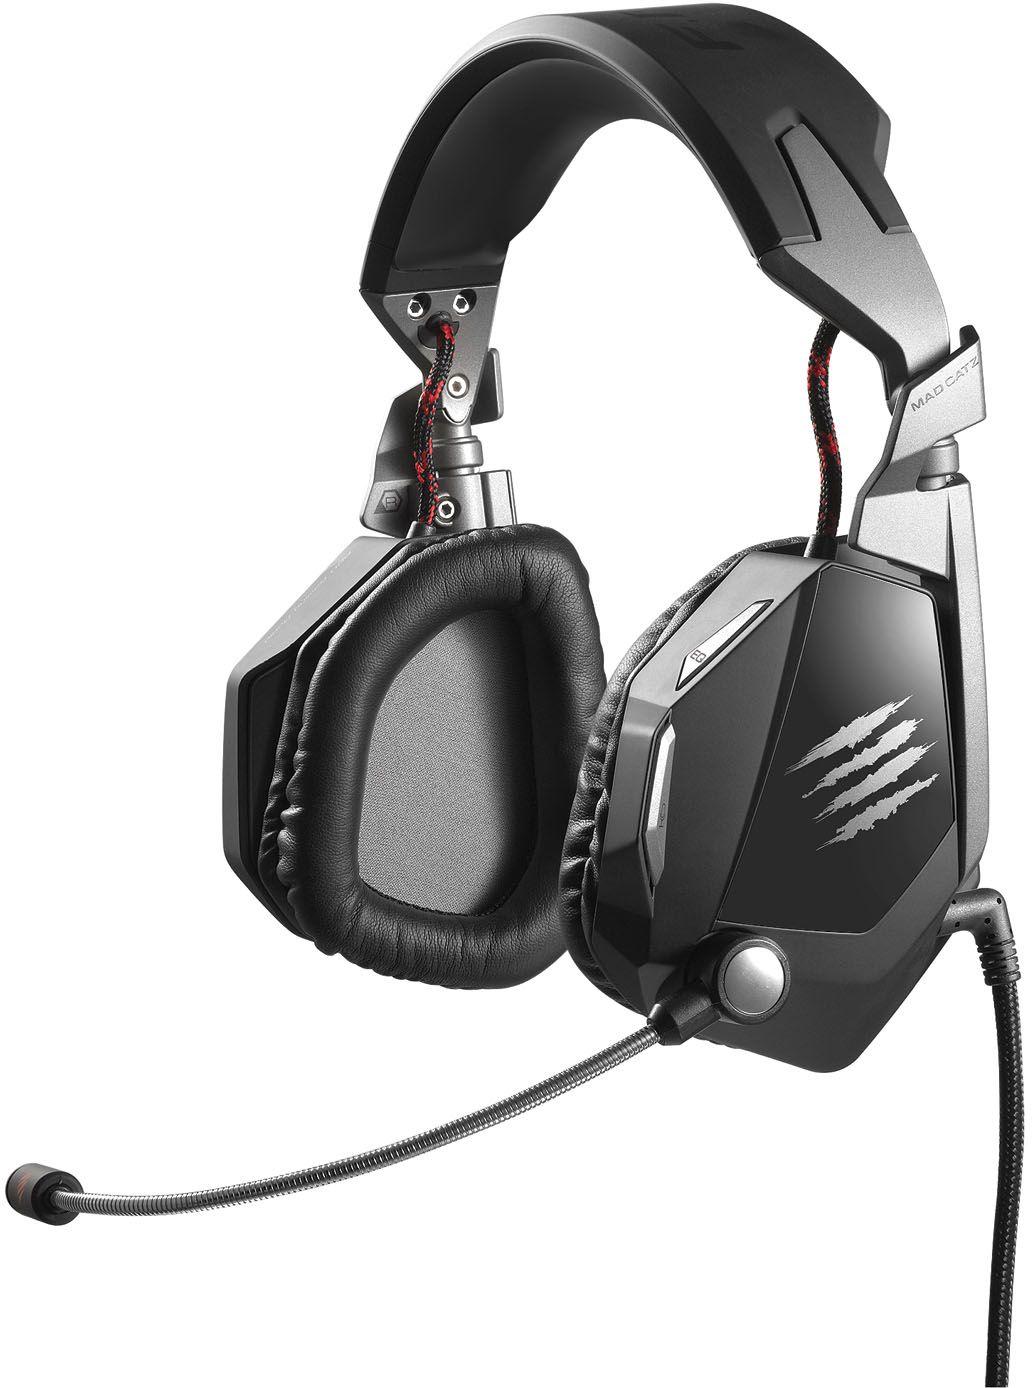 Mad Catz F.R.E.Q.5 Stereo Headset, Black игровые наушники